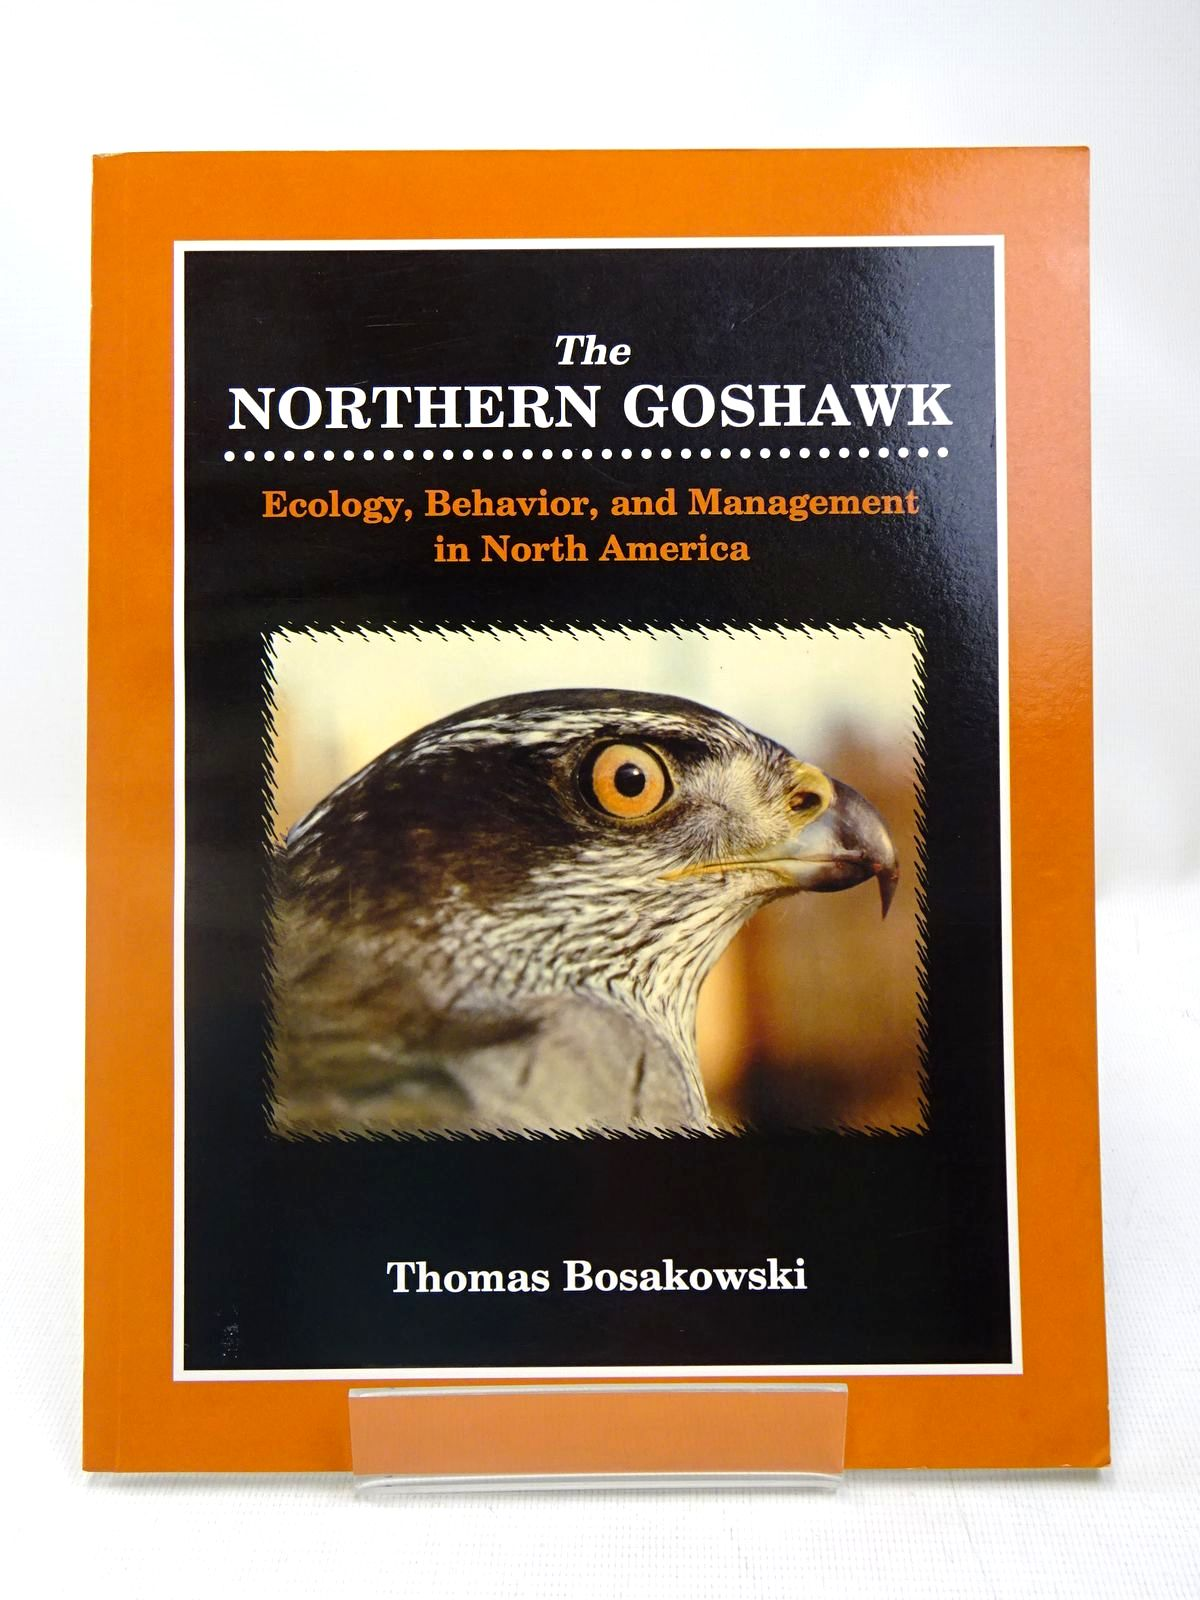 Photo of THE NORTHERN GOSHAWK written by Bosakowski, Thomas published by Hancock House Publishers (STOCK CODE: 1317462)  for sale by Stella & Rose's Books